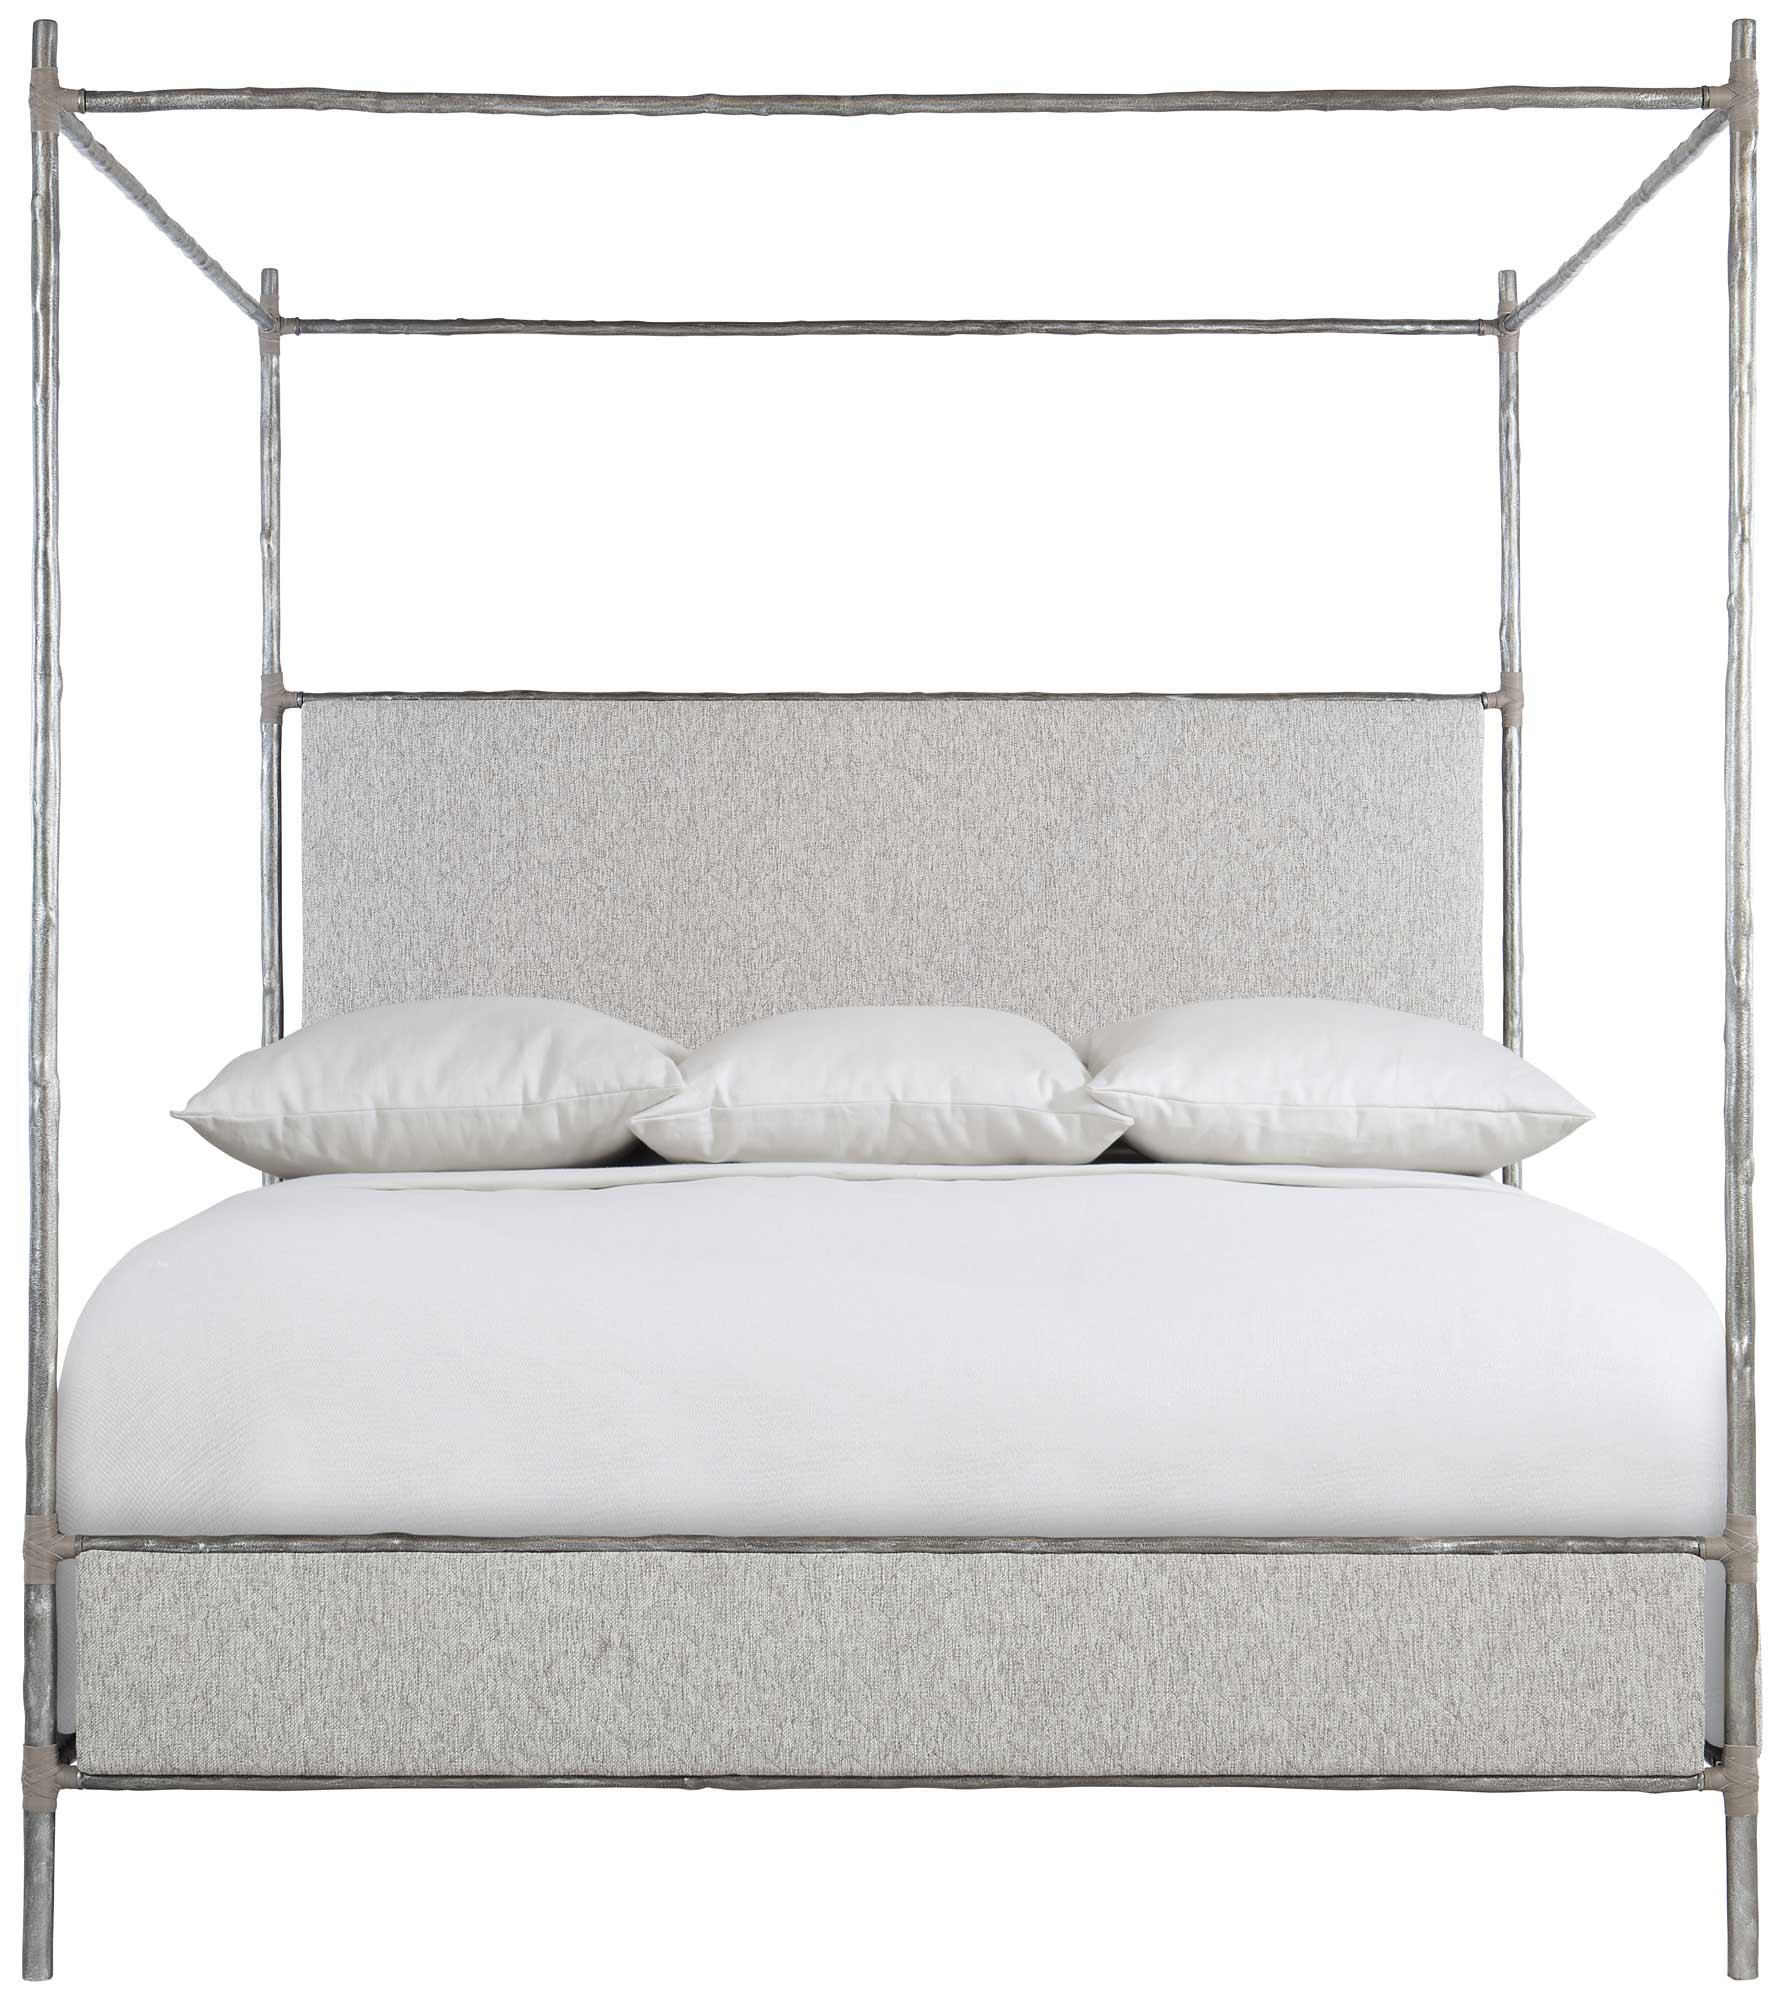 Interiors - Buchanan King Canopy Bed by Bernhardt at Belfort Furniture